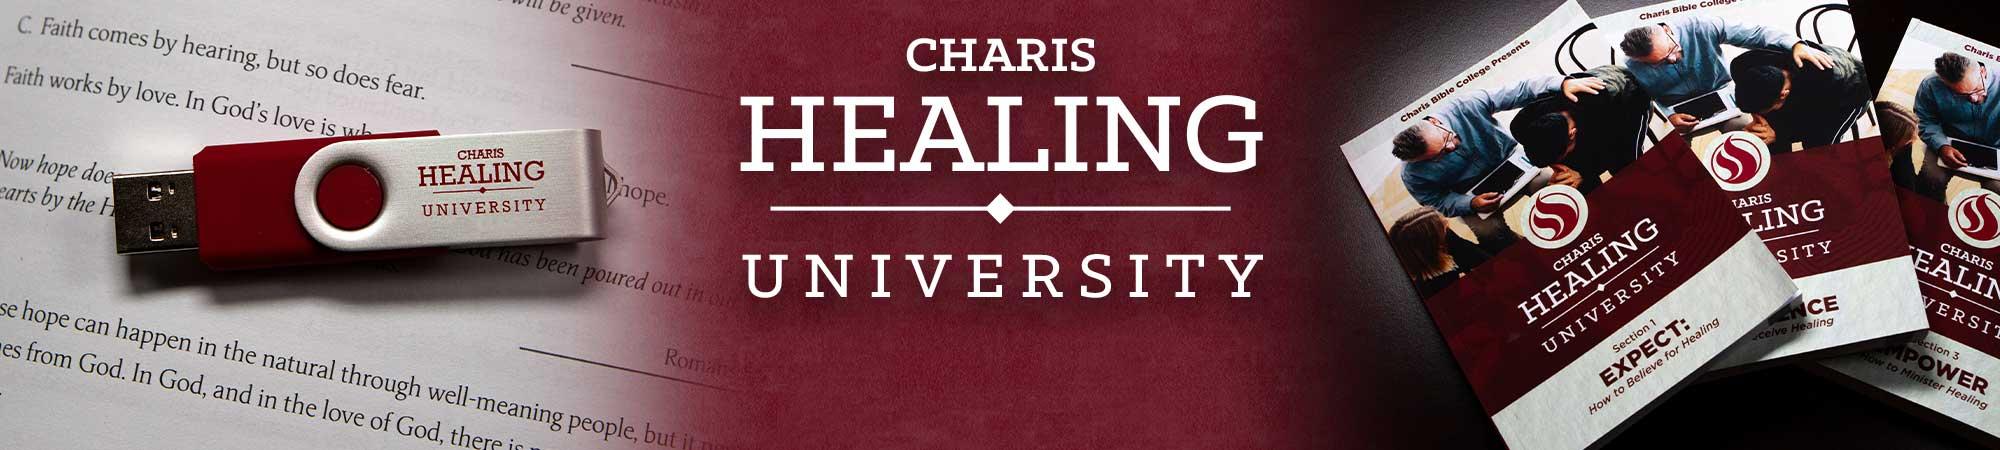 Charis Healing University